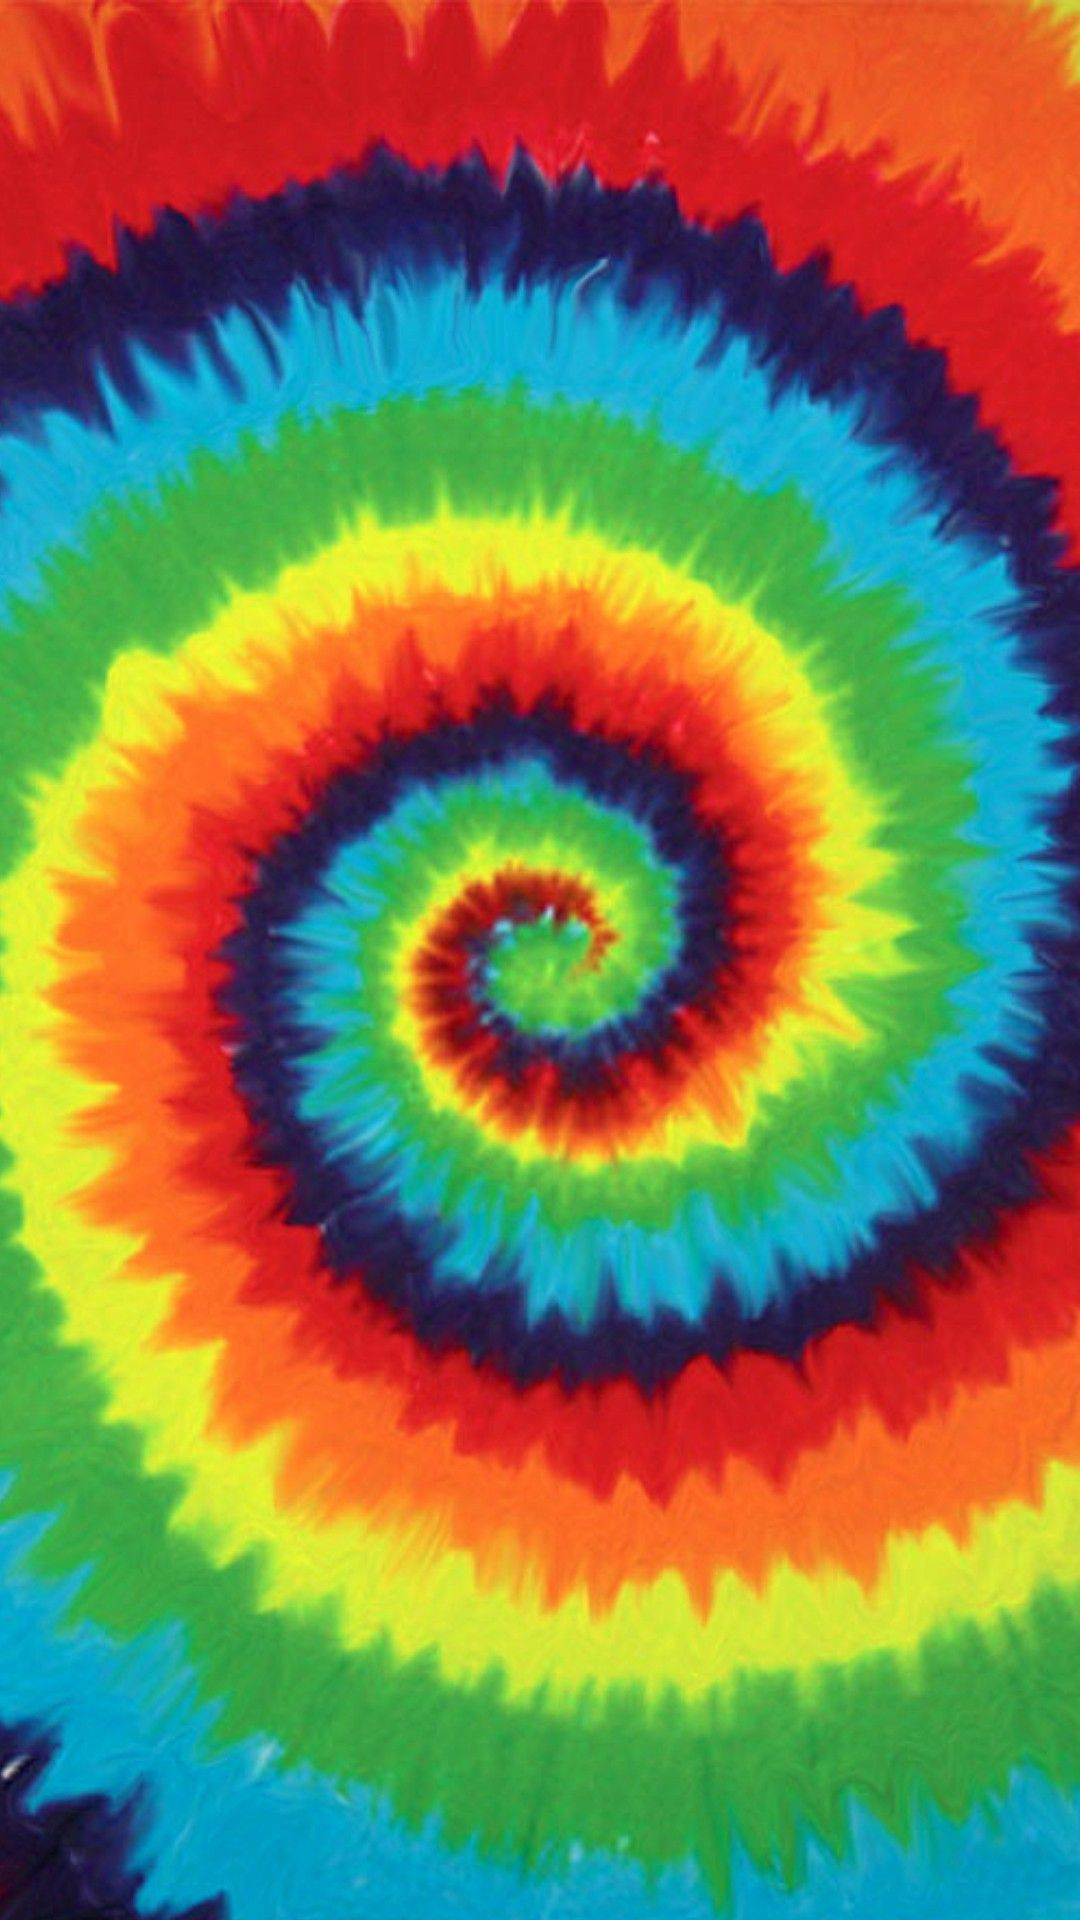 Tie Dye Aesthetic Wallpapers Colorful Wallpaper Iphone Wallpaper